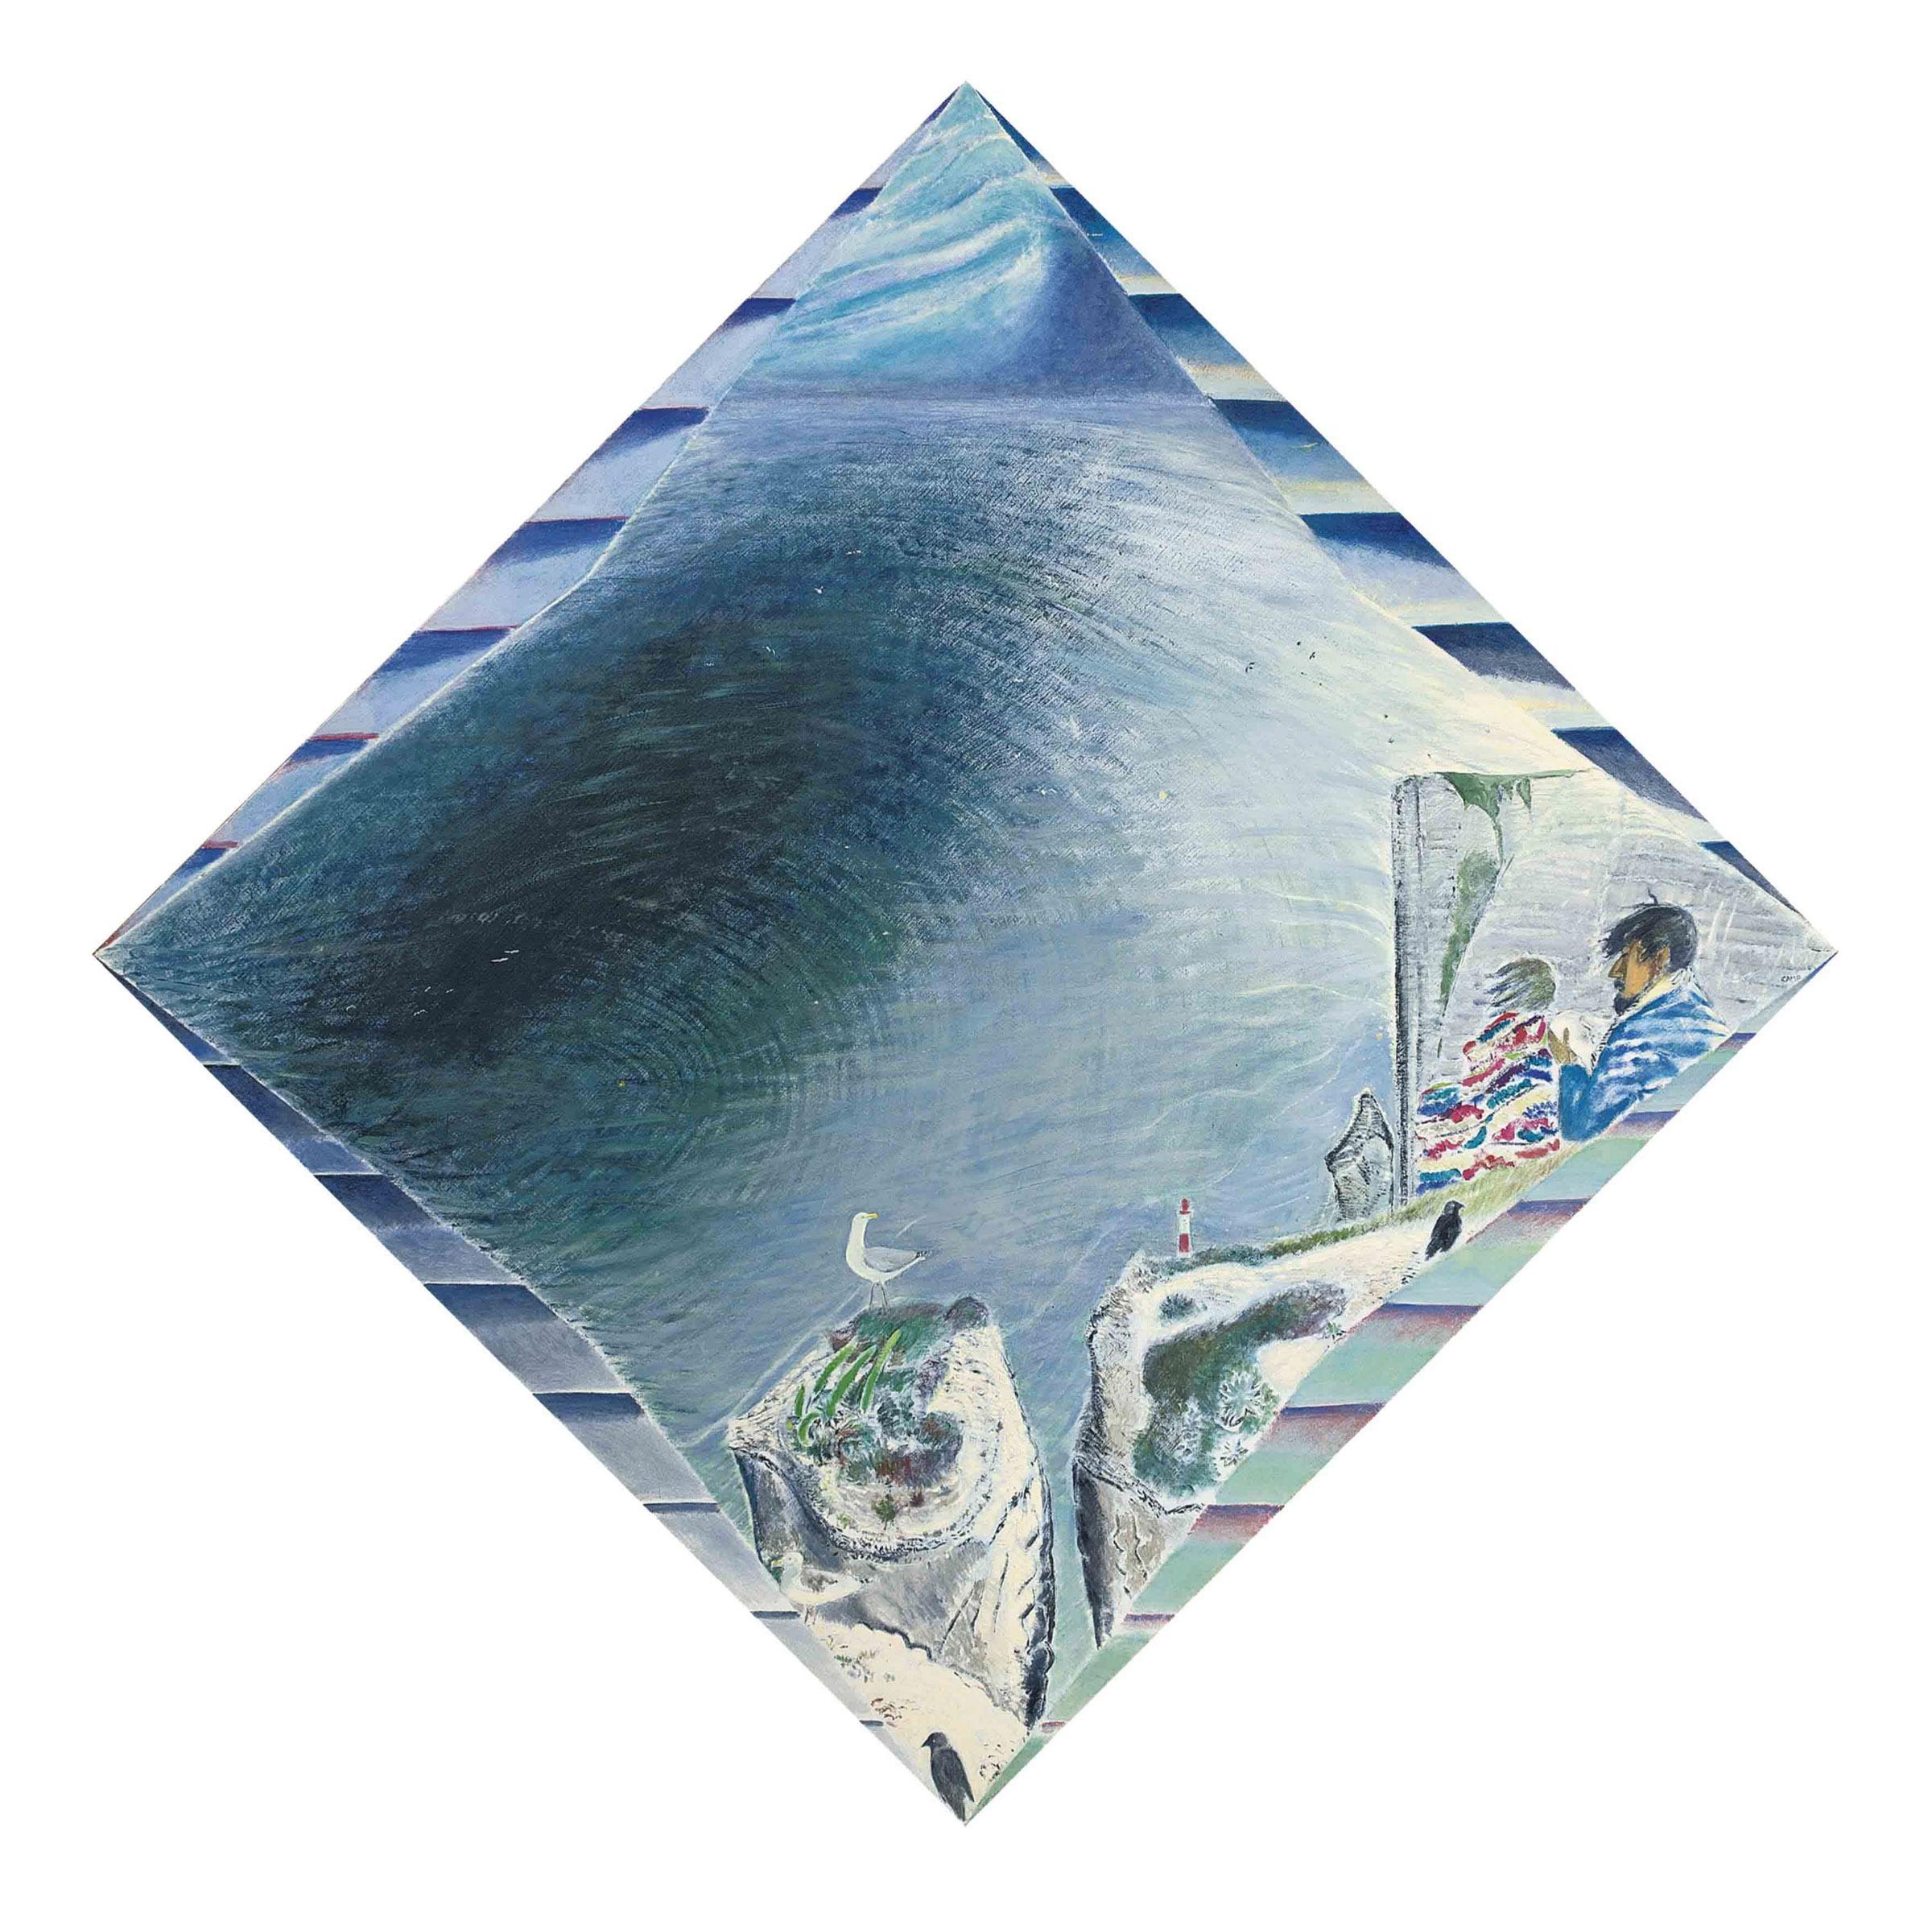 Beachy Head: Gull over Chasm